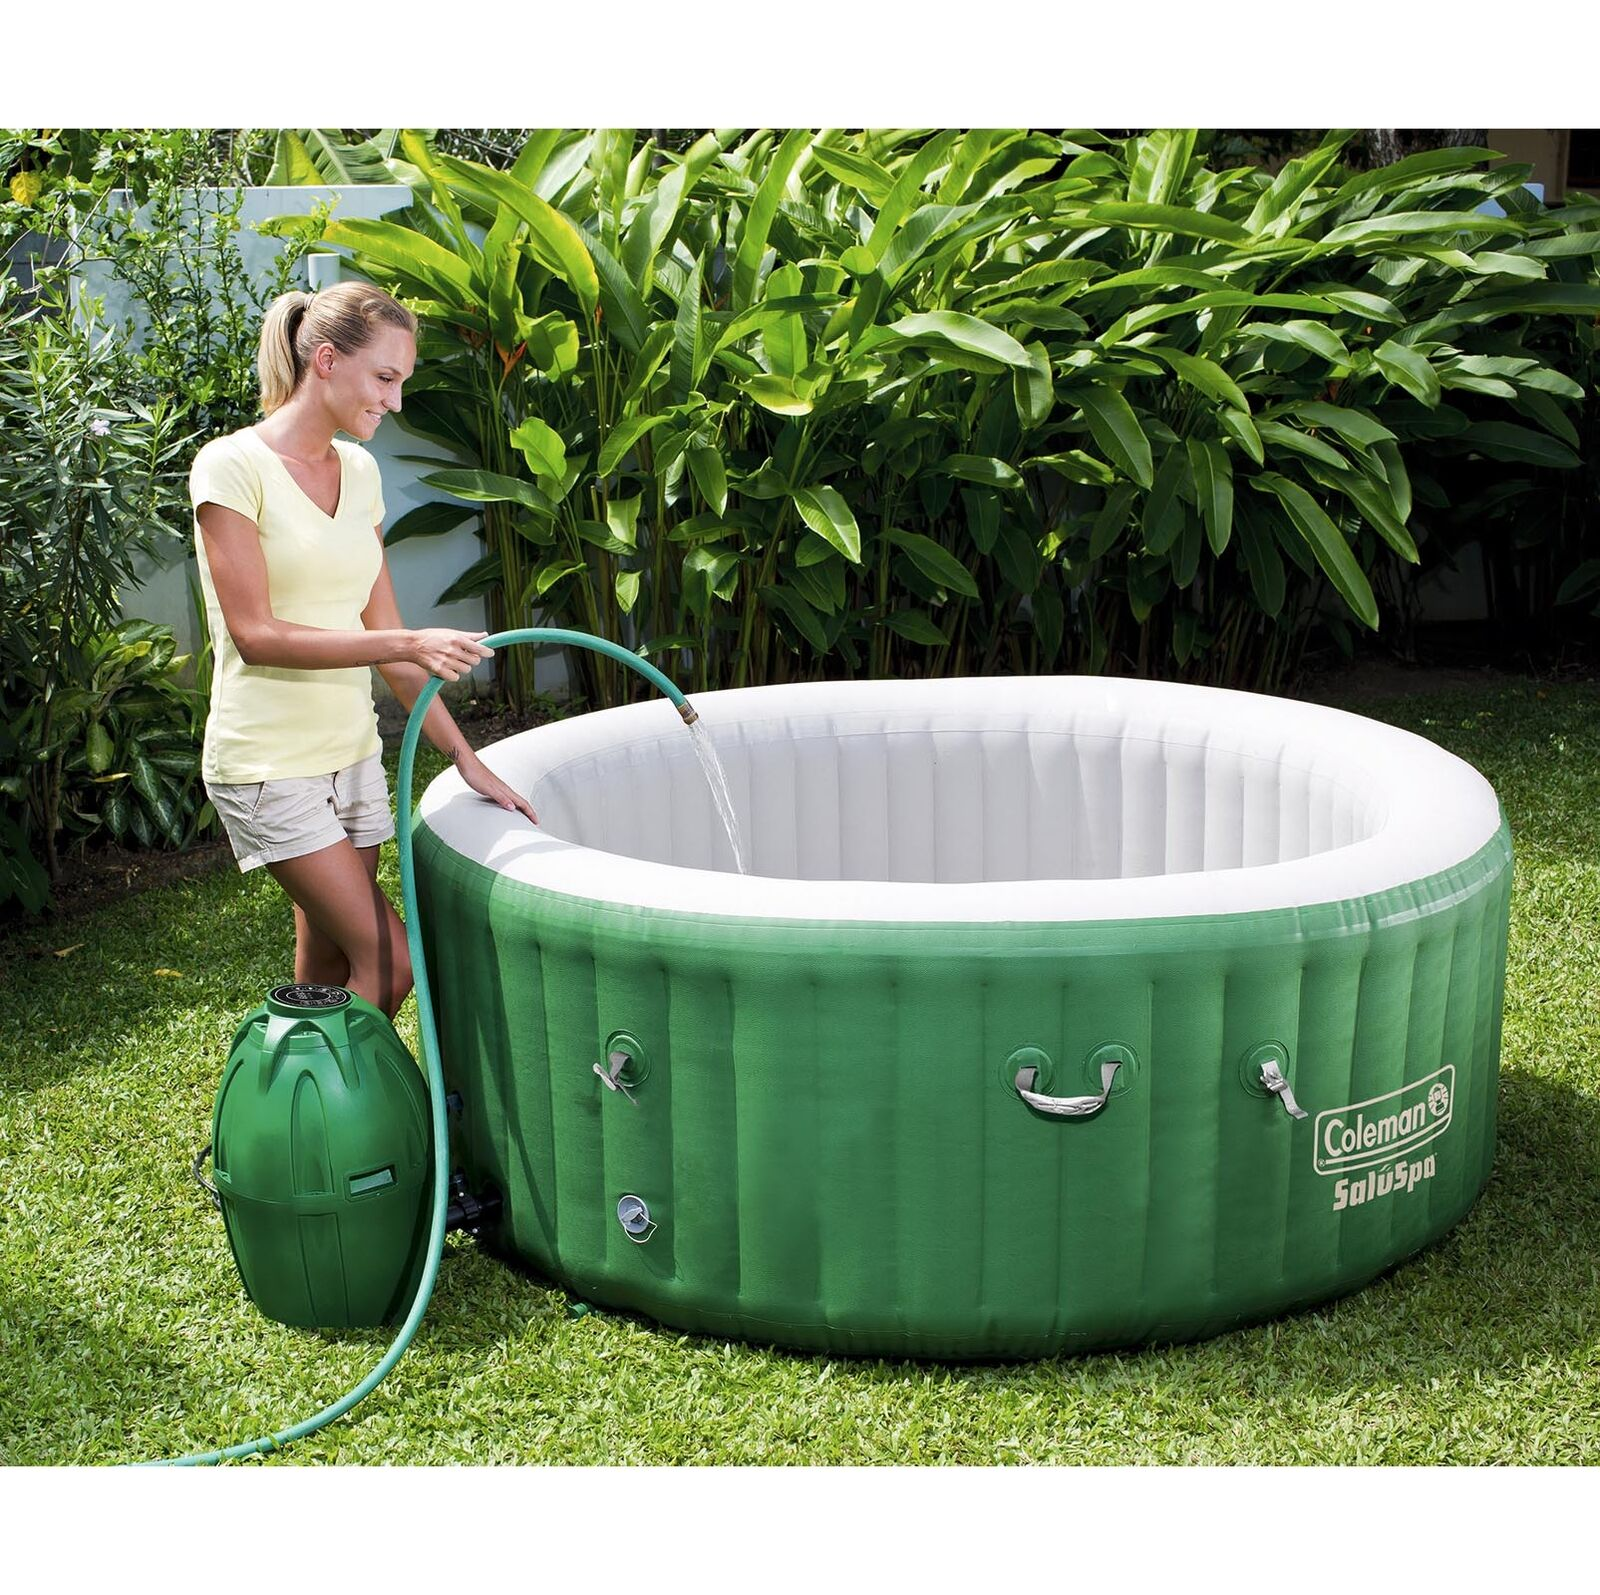 Fine Jet Spa For Tub Images - Bathtub Design Ideas - valtak.com